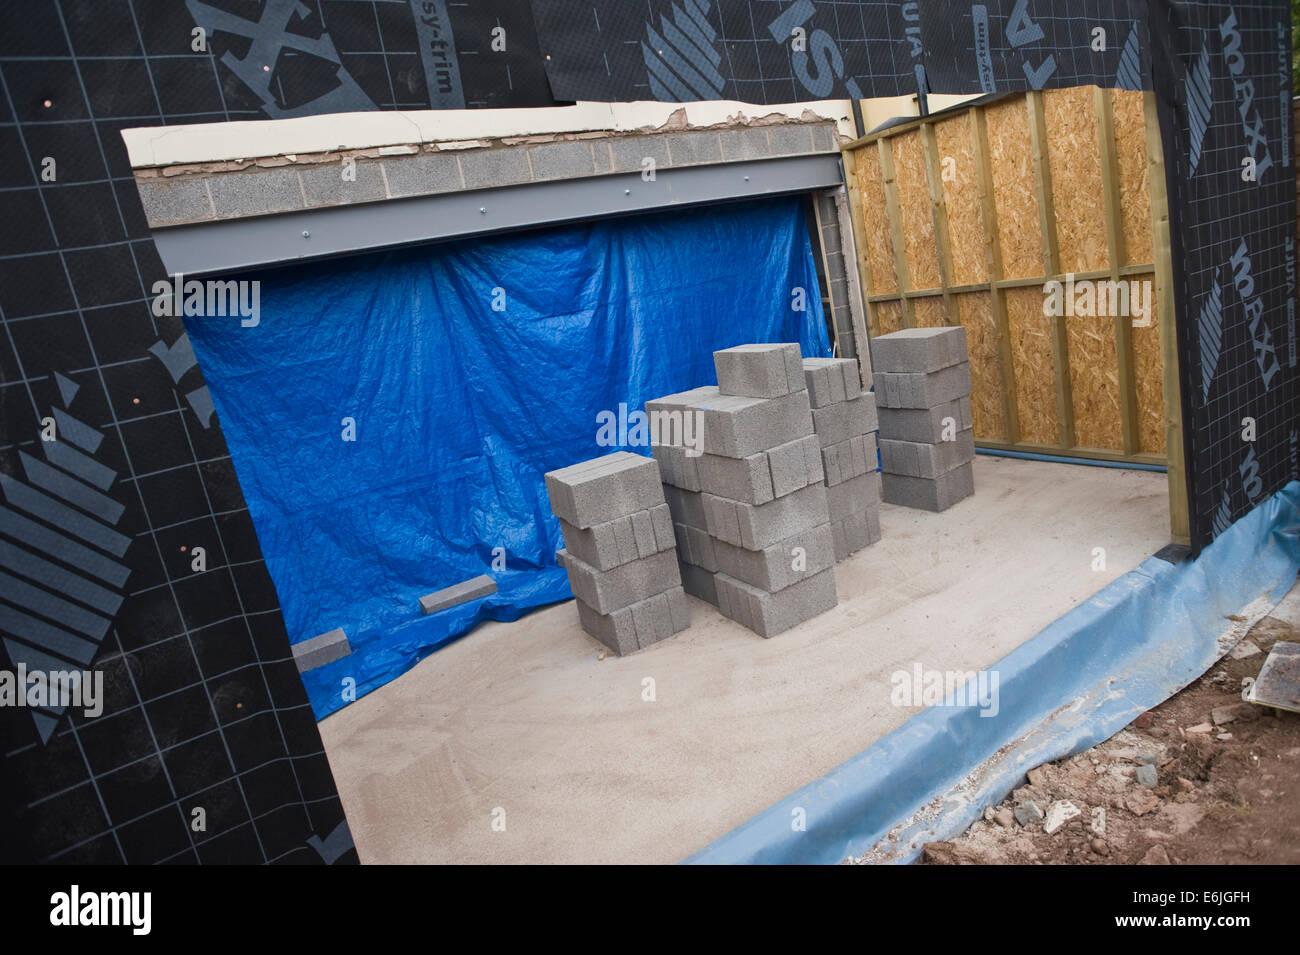 Steel Frame Home Stockfotos & Steel Frame Home Bilder - Alamy